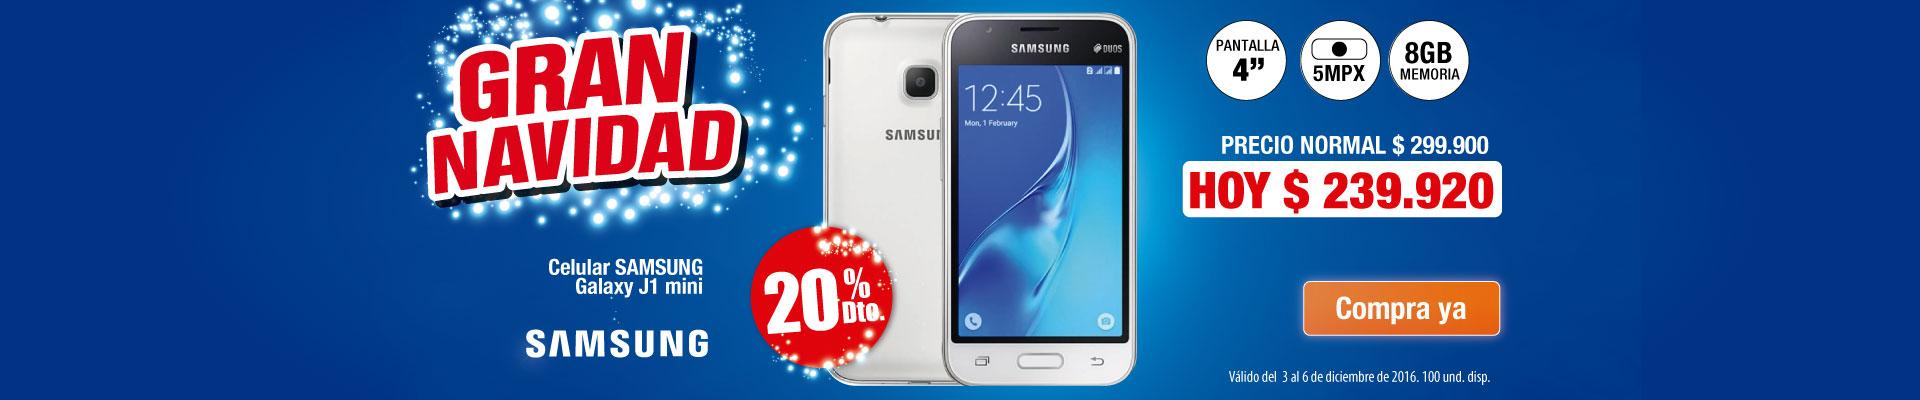 Celular Samsung Galaxy J1 mini - AK